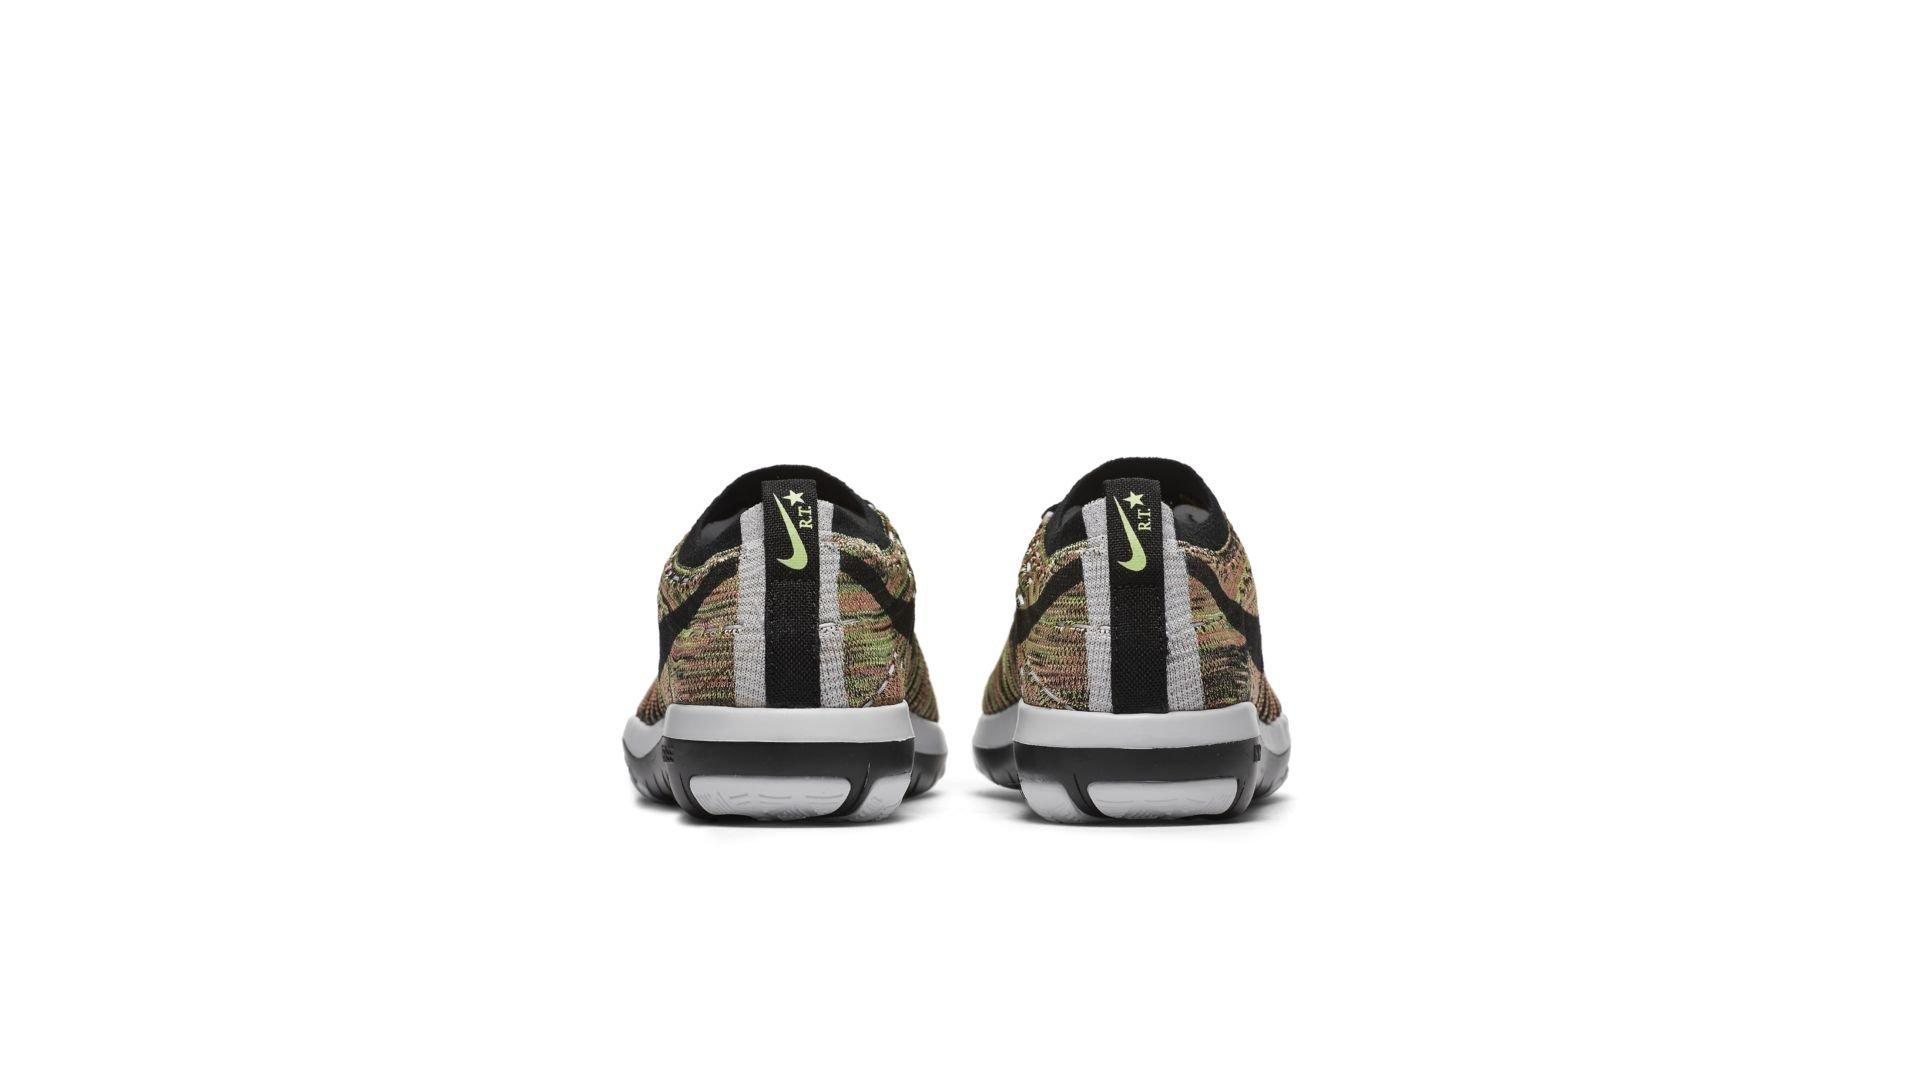 Nike Free Transform Flyknit Tisci Multi-Color (844818-900)